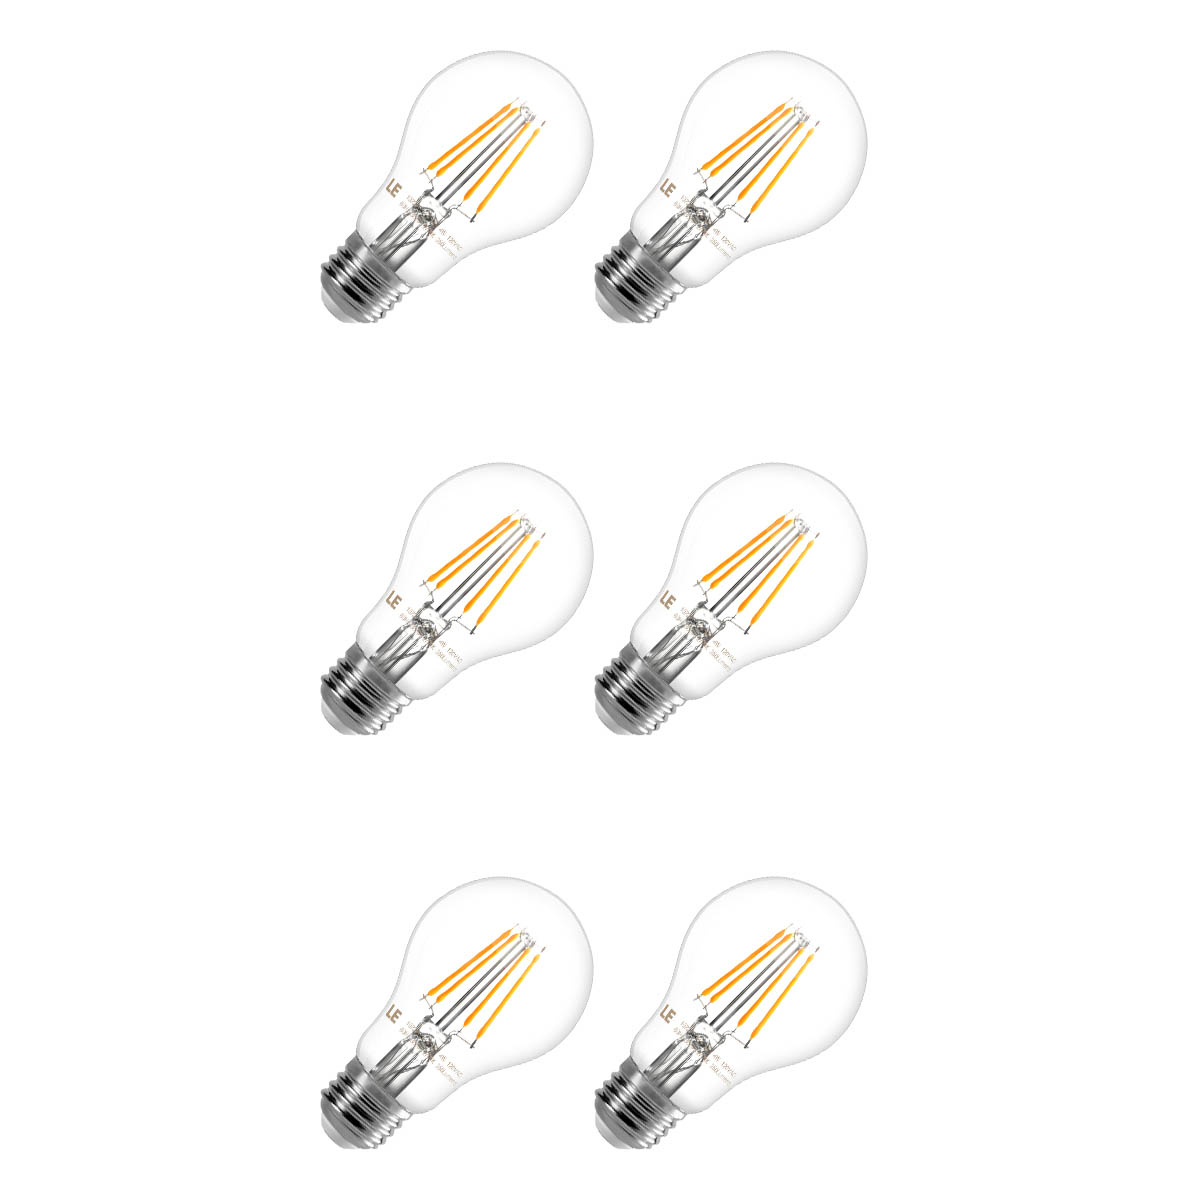 4w Warm White A19 E26 Led Light Bulbs 40 Watt Incandescent